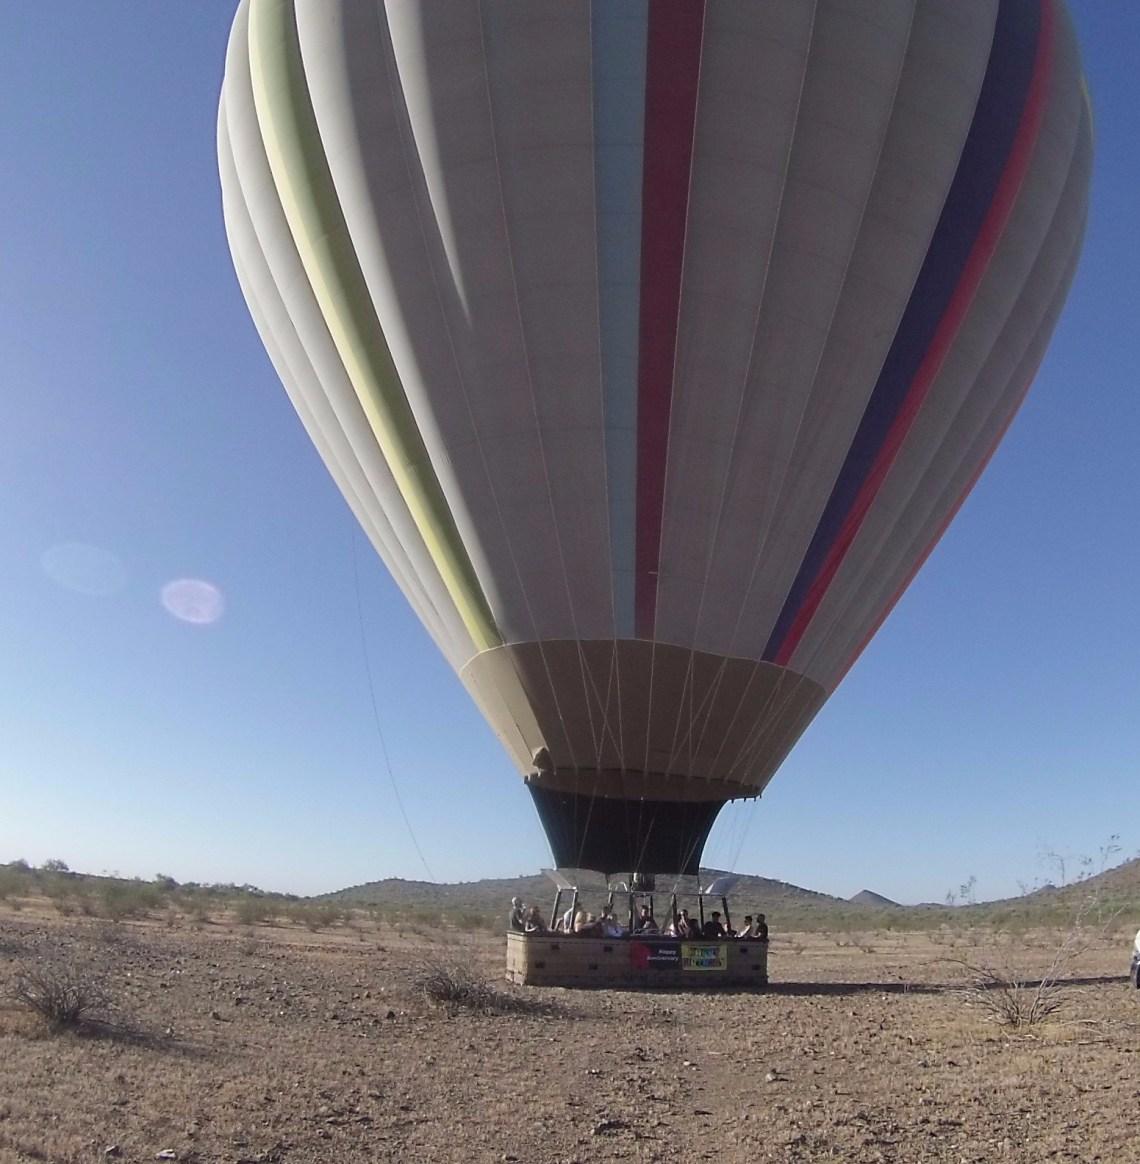 Hot air balloon resting on mostly barren desert